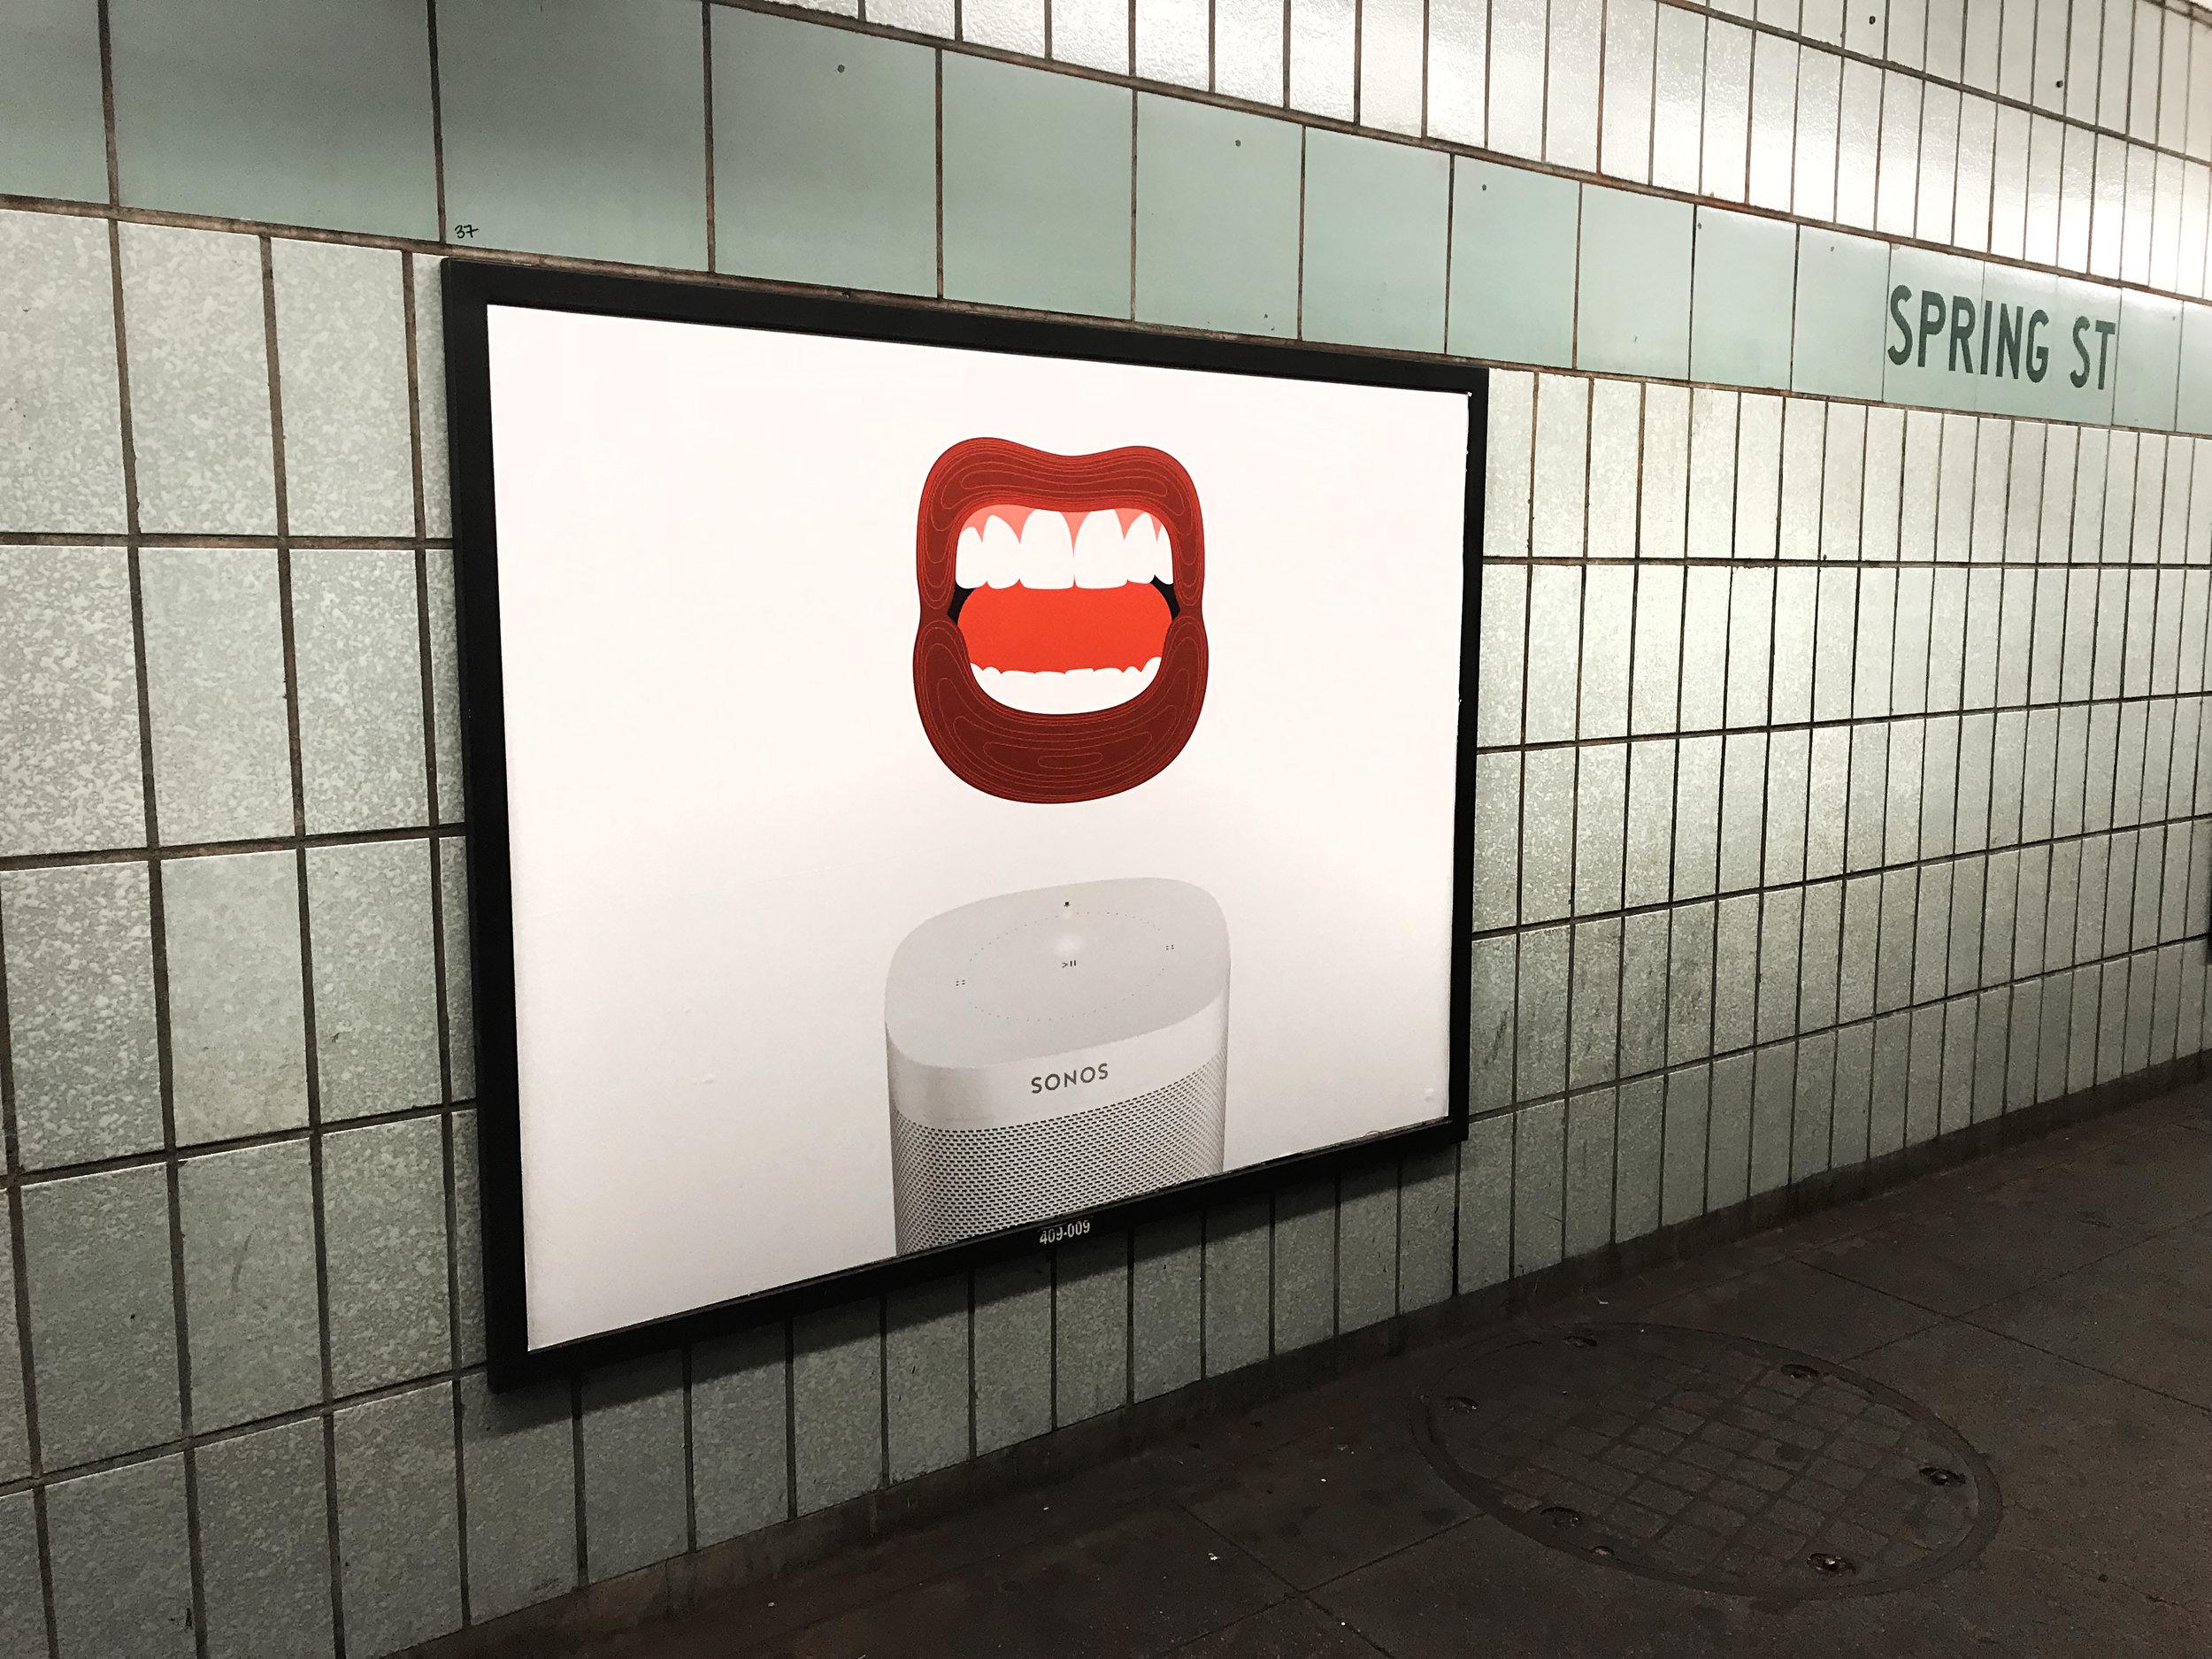 Sonos_station9.jpg